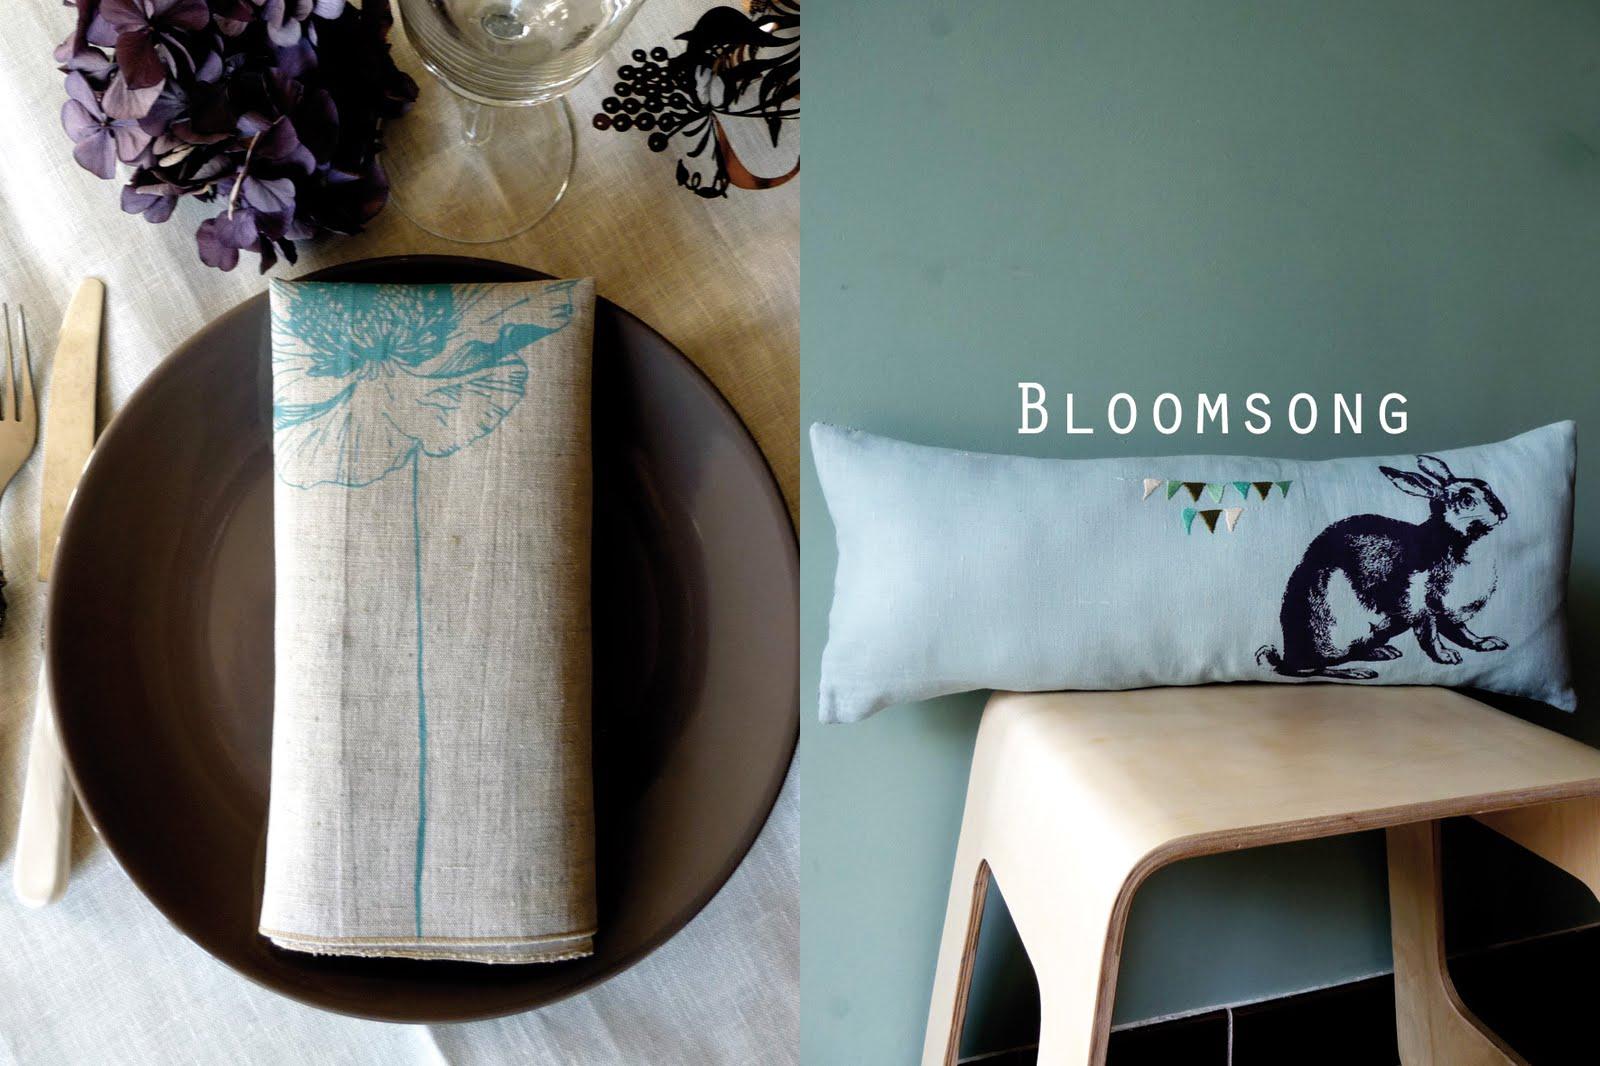 Bloomsong